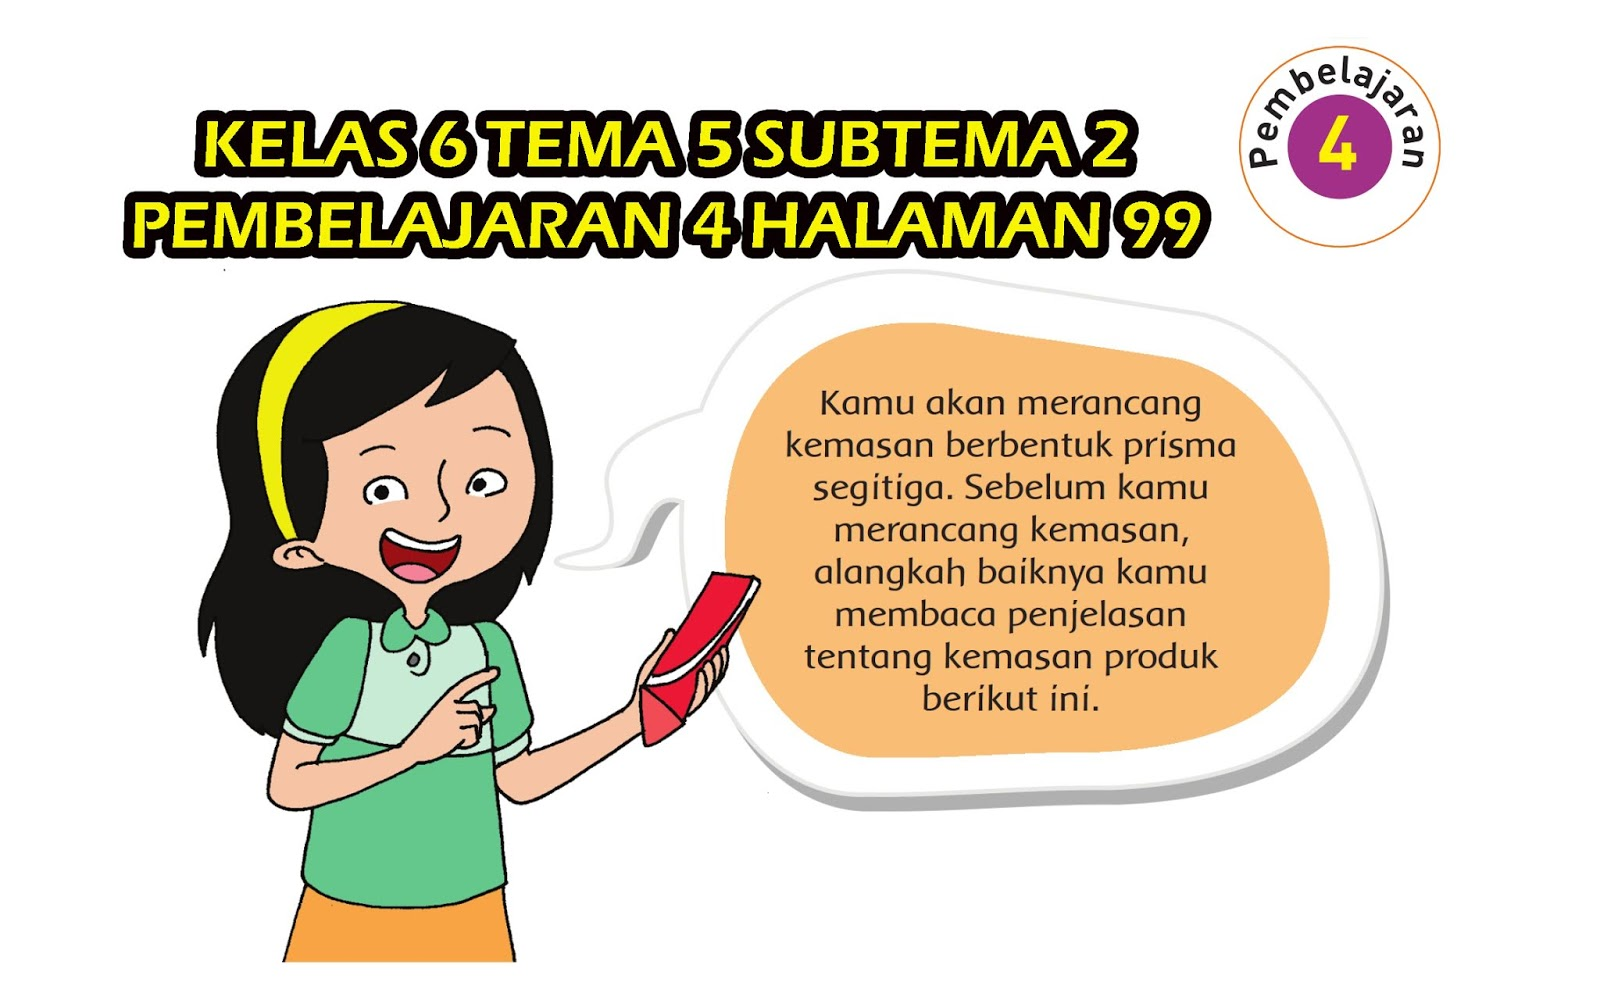 Kunci Jawaban Tematik Kelas 6 Tema 5 Subtema 2 ...